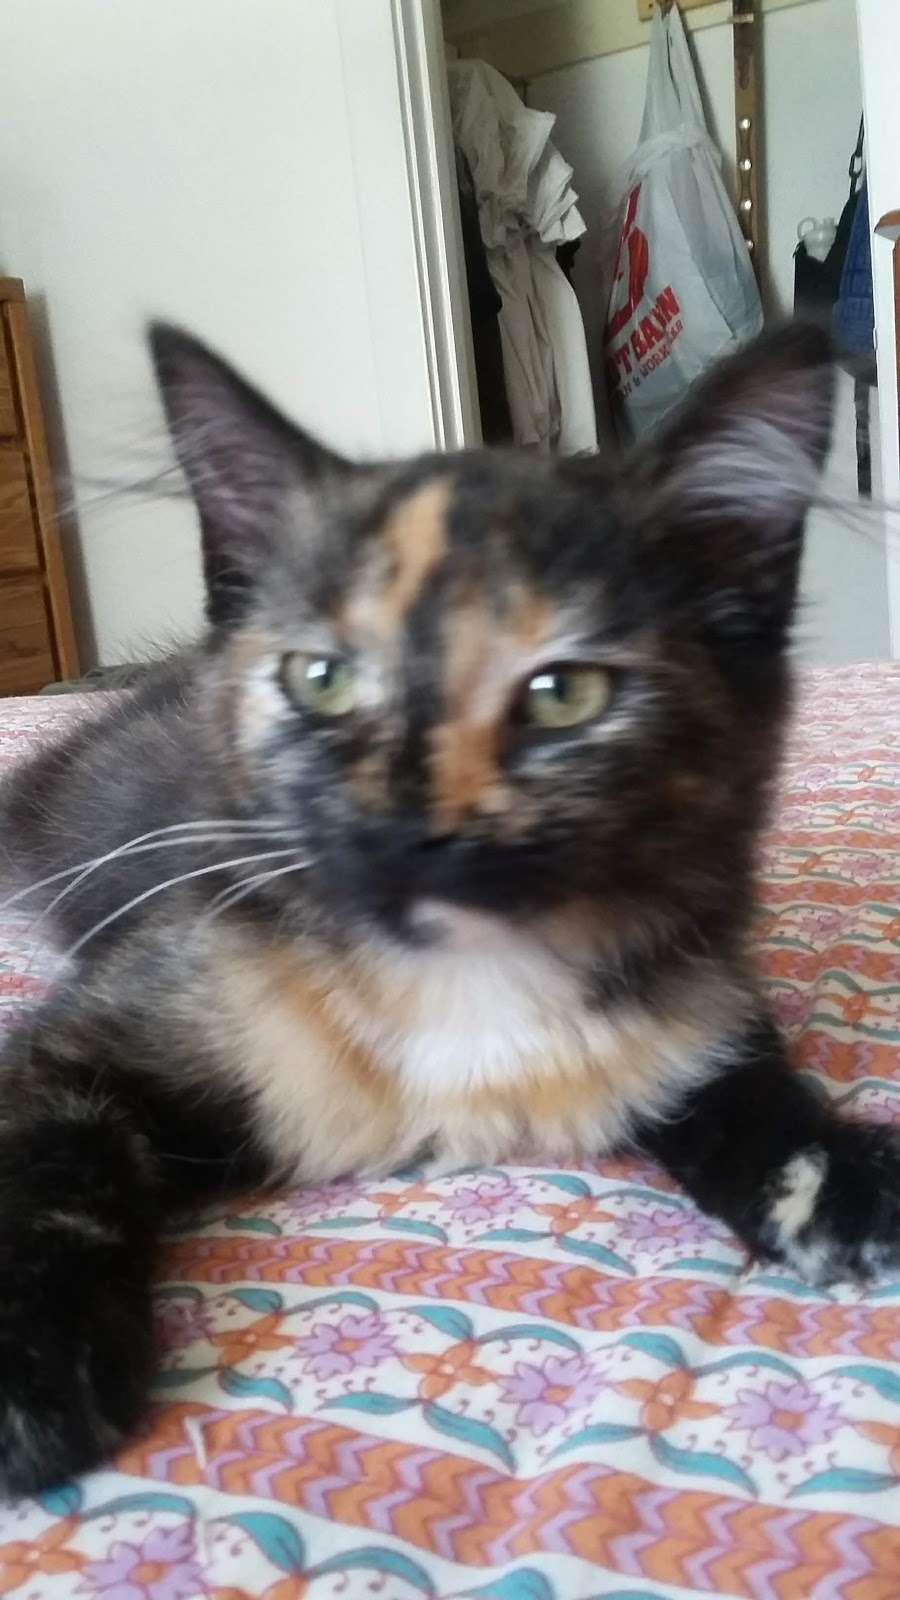 Five Star Veterinary Center - veterinary care  | Photo 4 of 8 | Address: 13725 Foothill Blvd, Sylmar, CA 91342, USA | Phone: (818) 362-6599